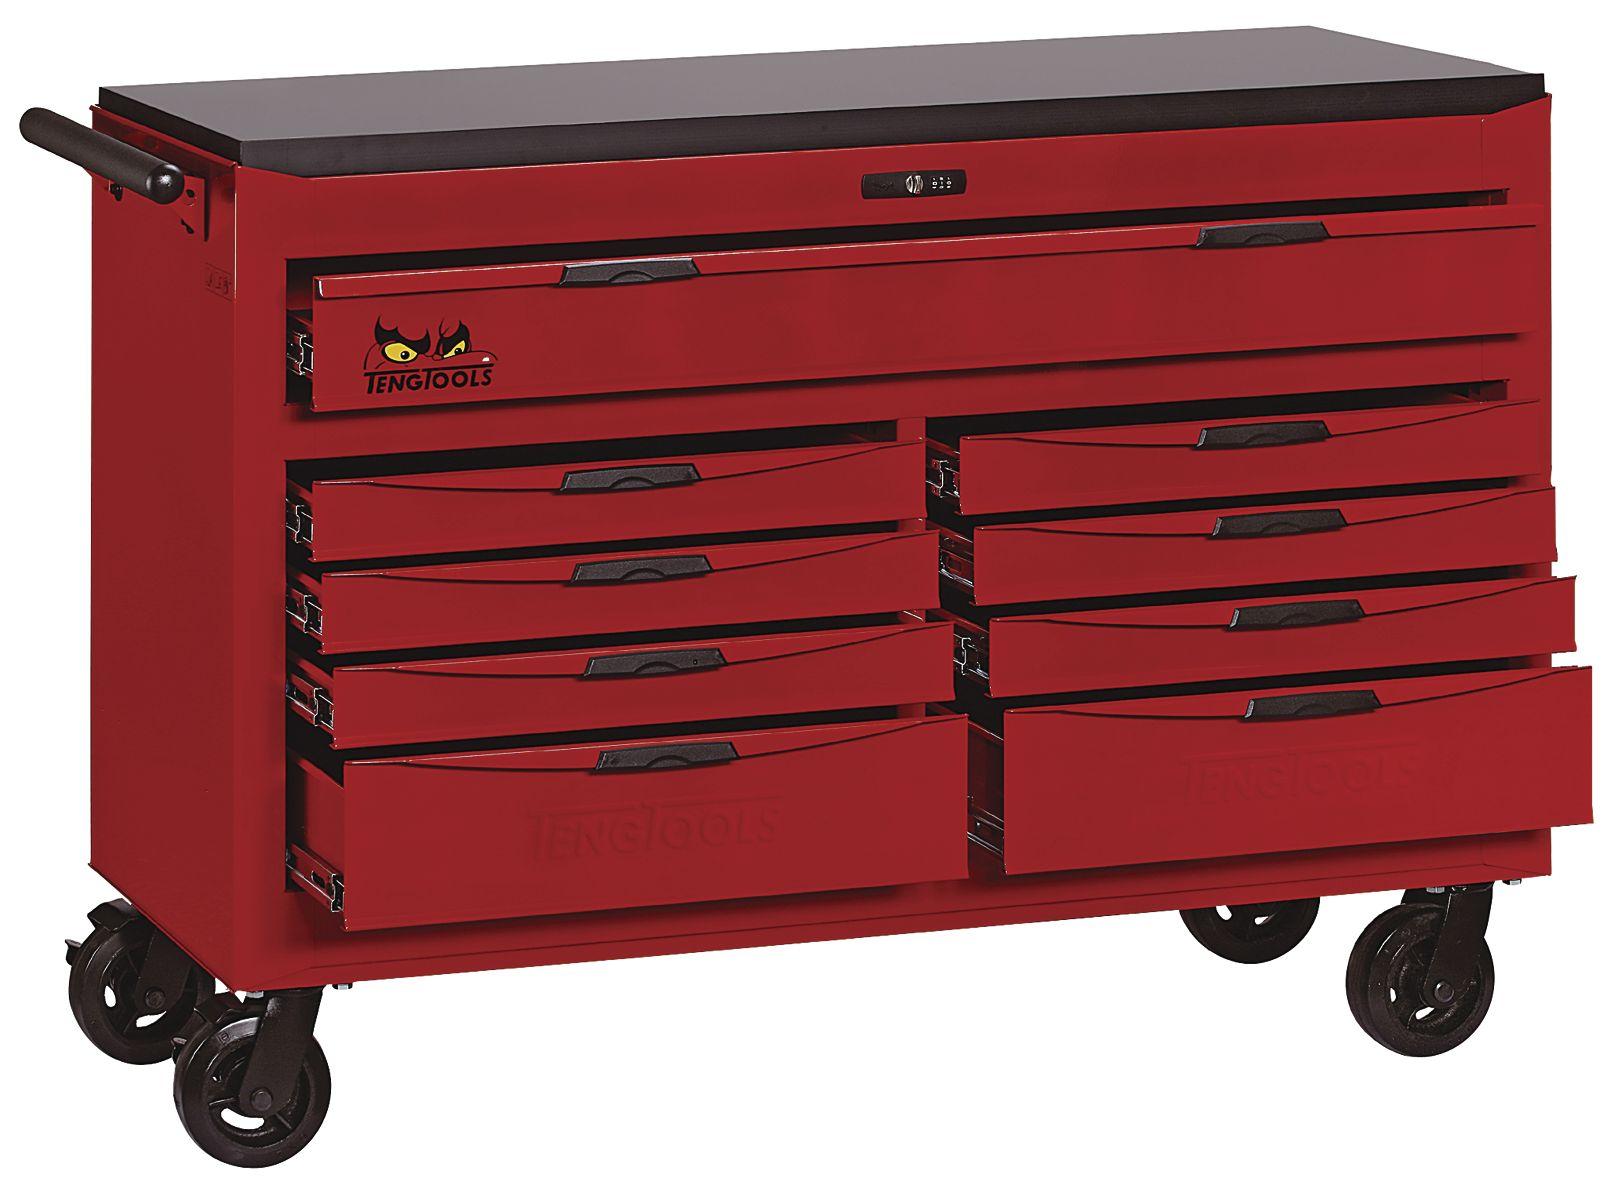 Tcw809n coffres servantes d 39 outils coffres servantes d 39 outils vynckier tools - Carro herramientas barato ...